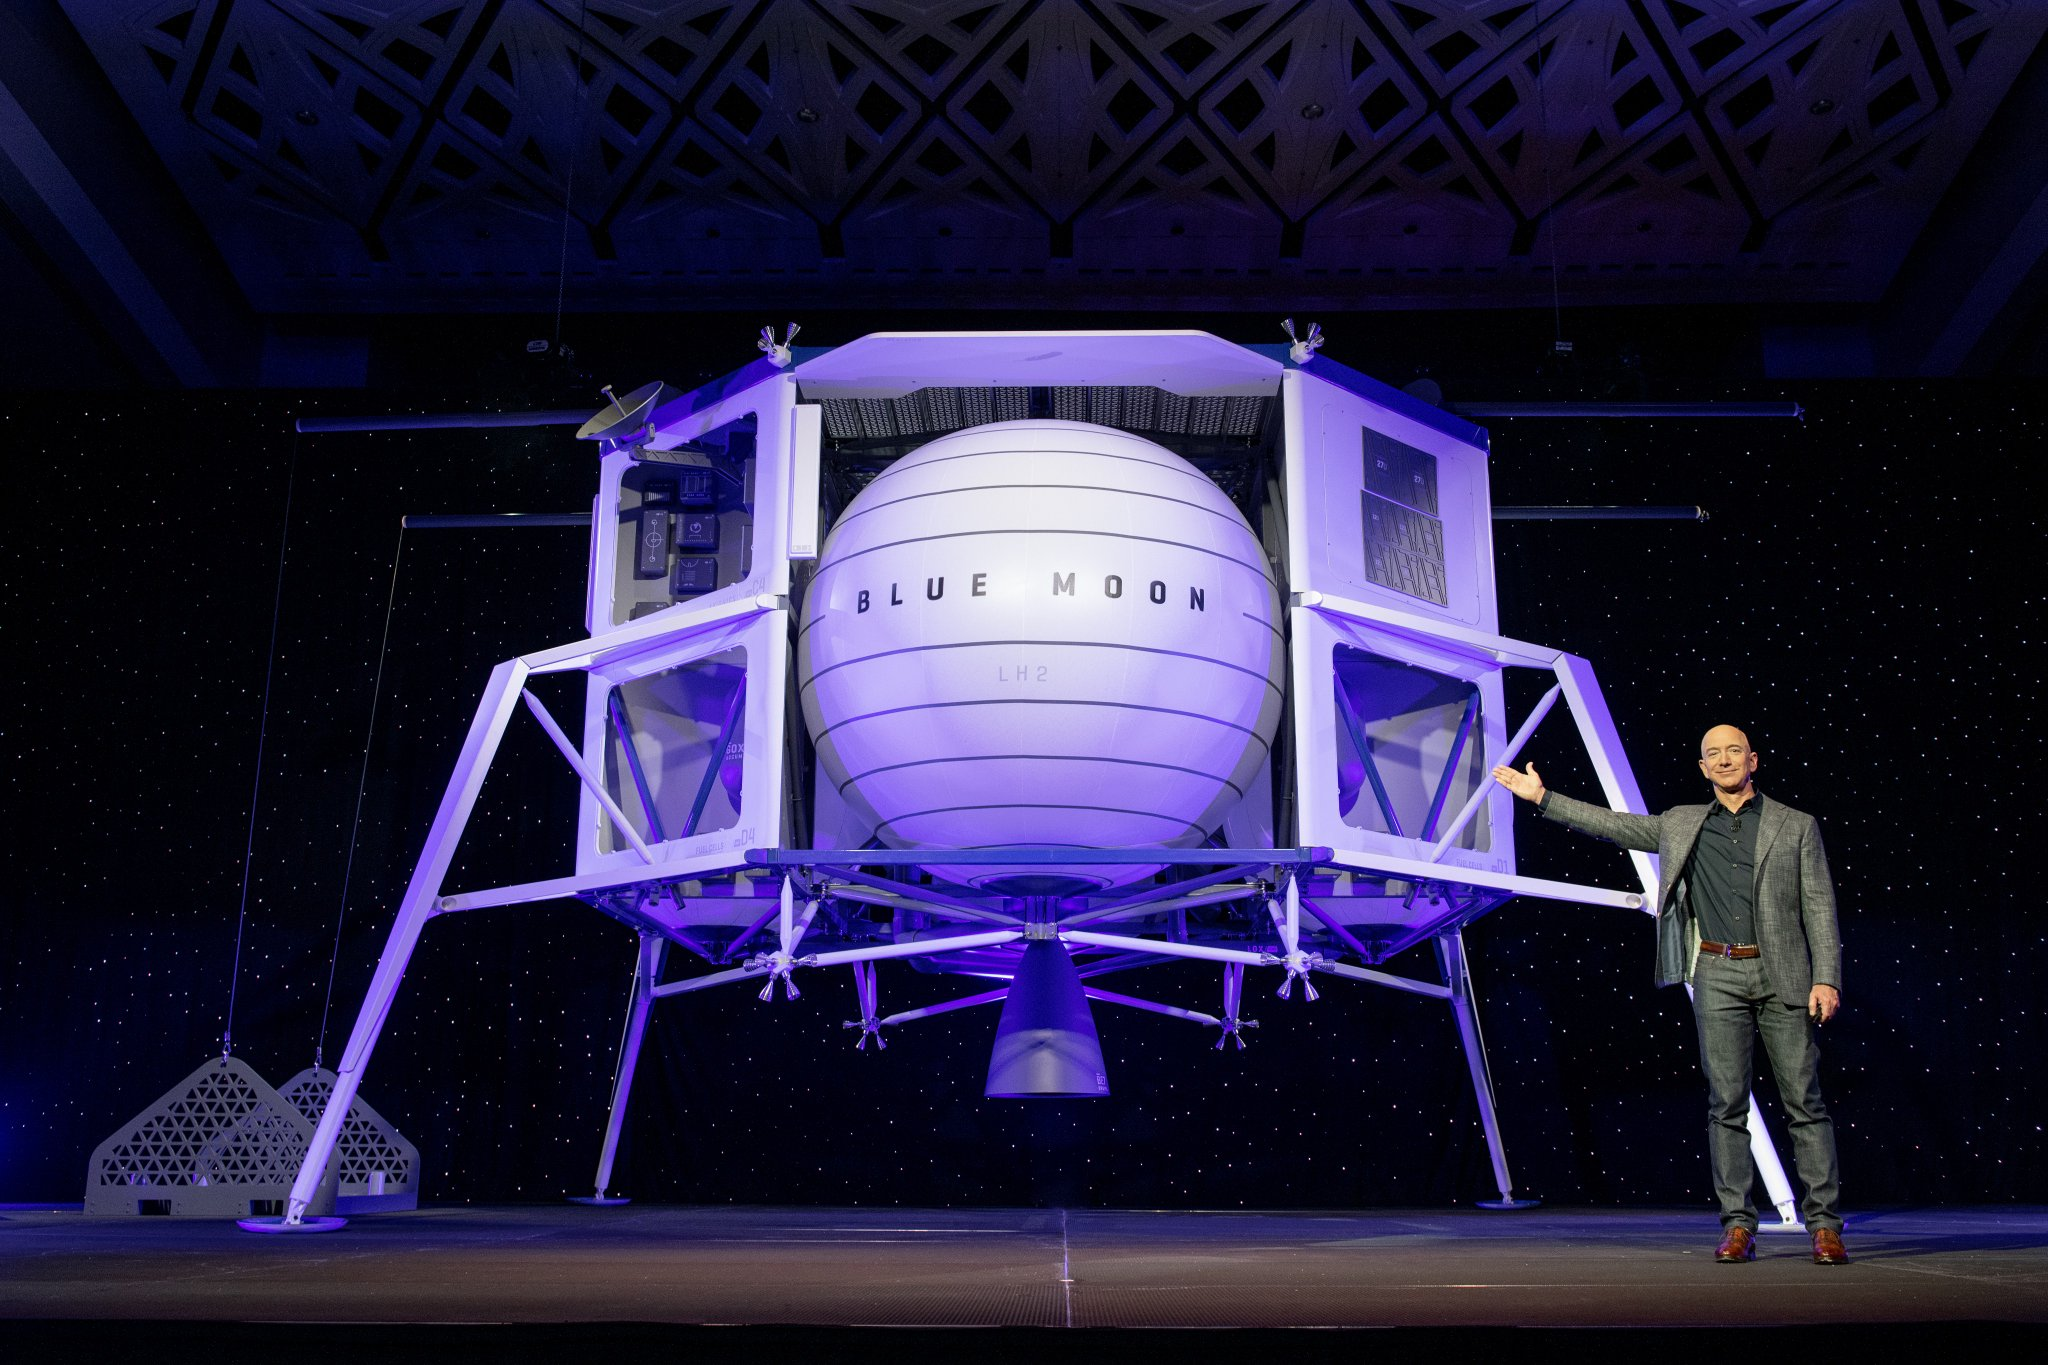 Jeff Bezos next to the Blue Moon lunar lander